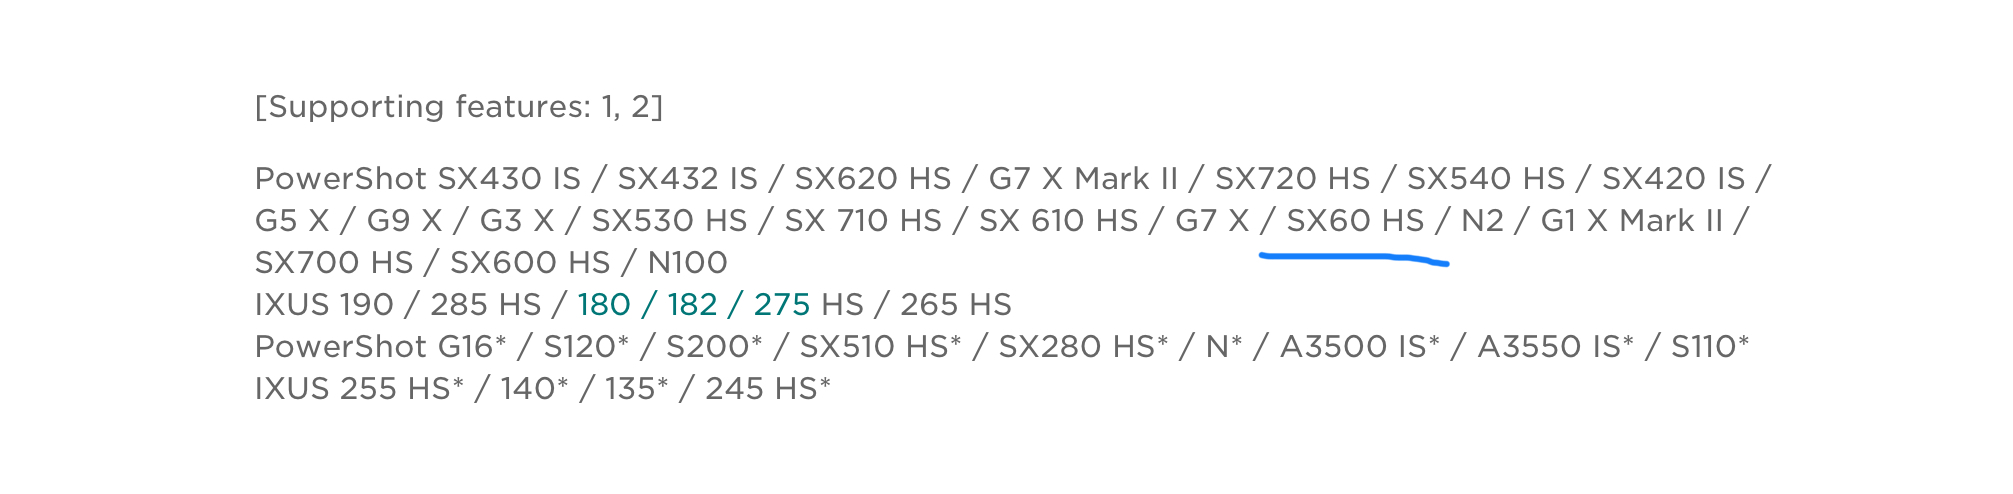 F4024E89-9BA0-4910-8F55-E89A83B263DF.jpeg